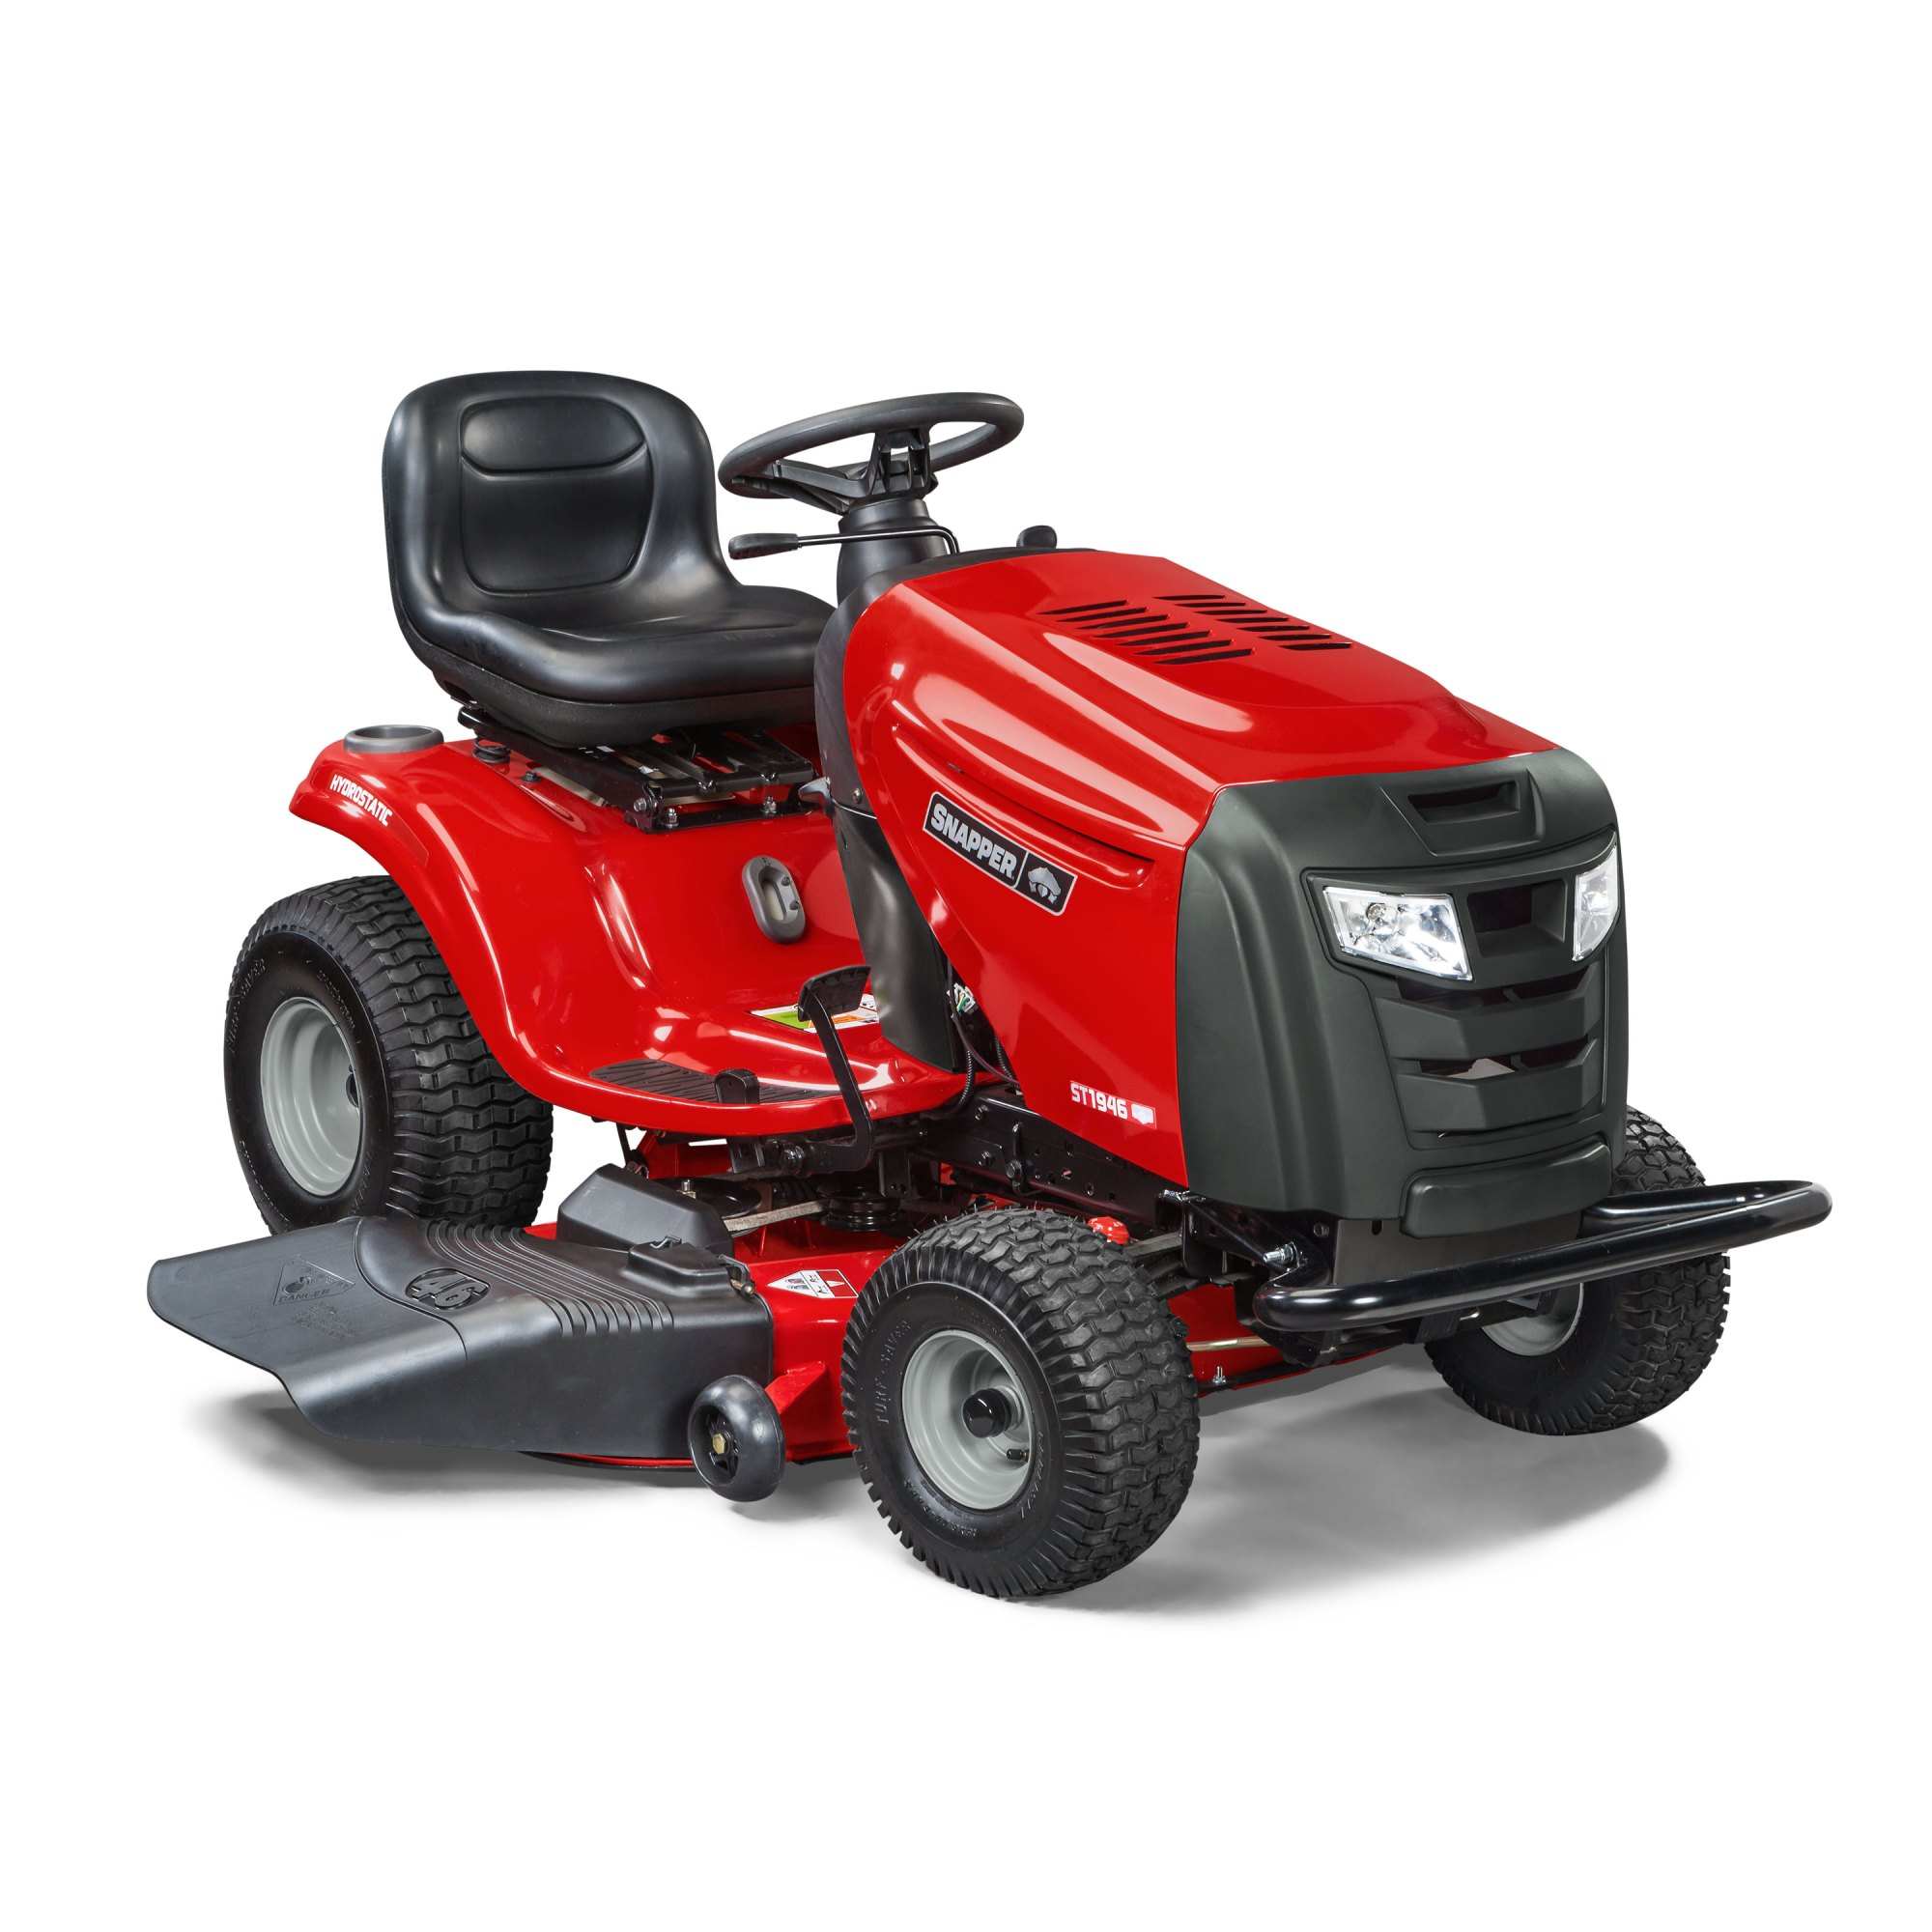 hight resolution of 19 hp briggs stratton riding lawn tractor st1946 walmart com